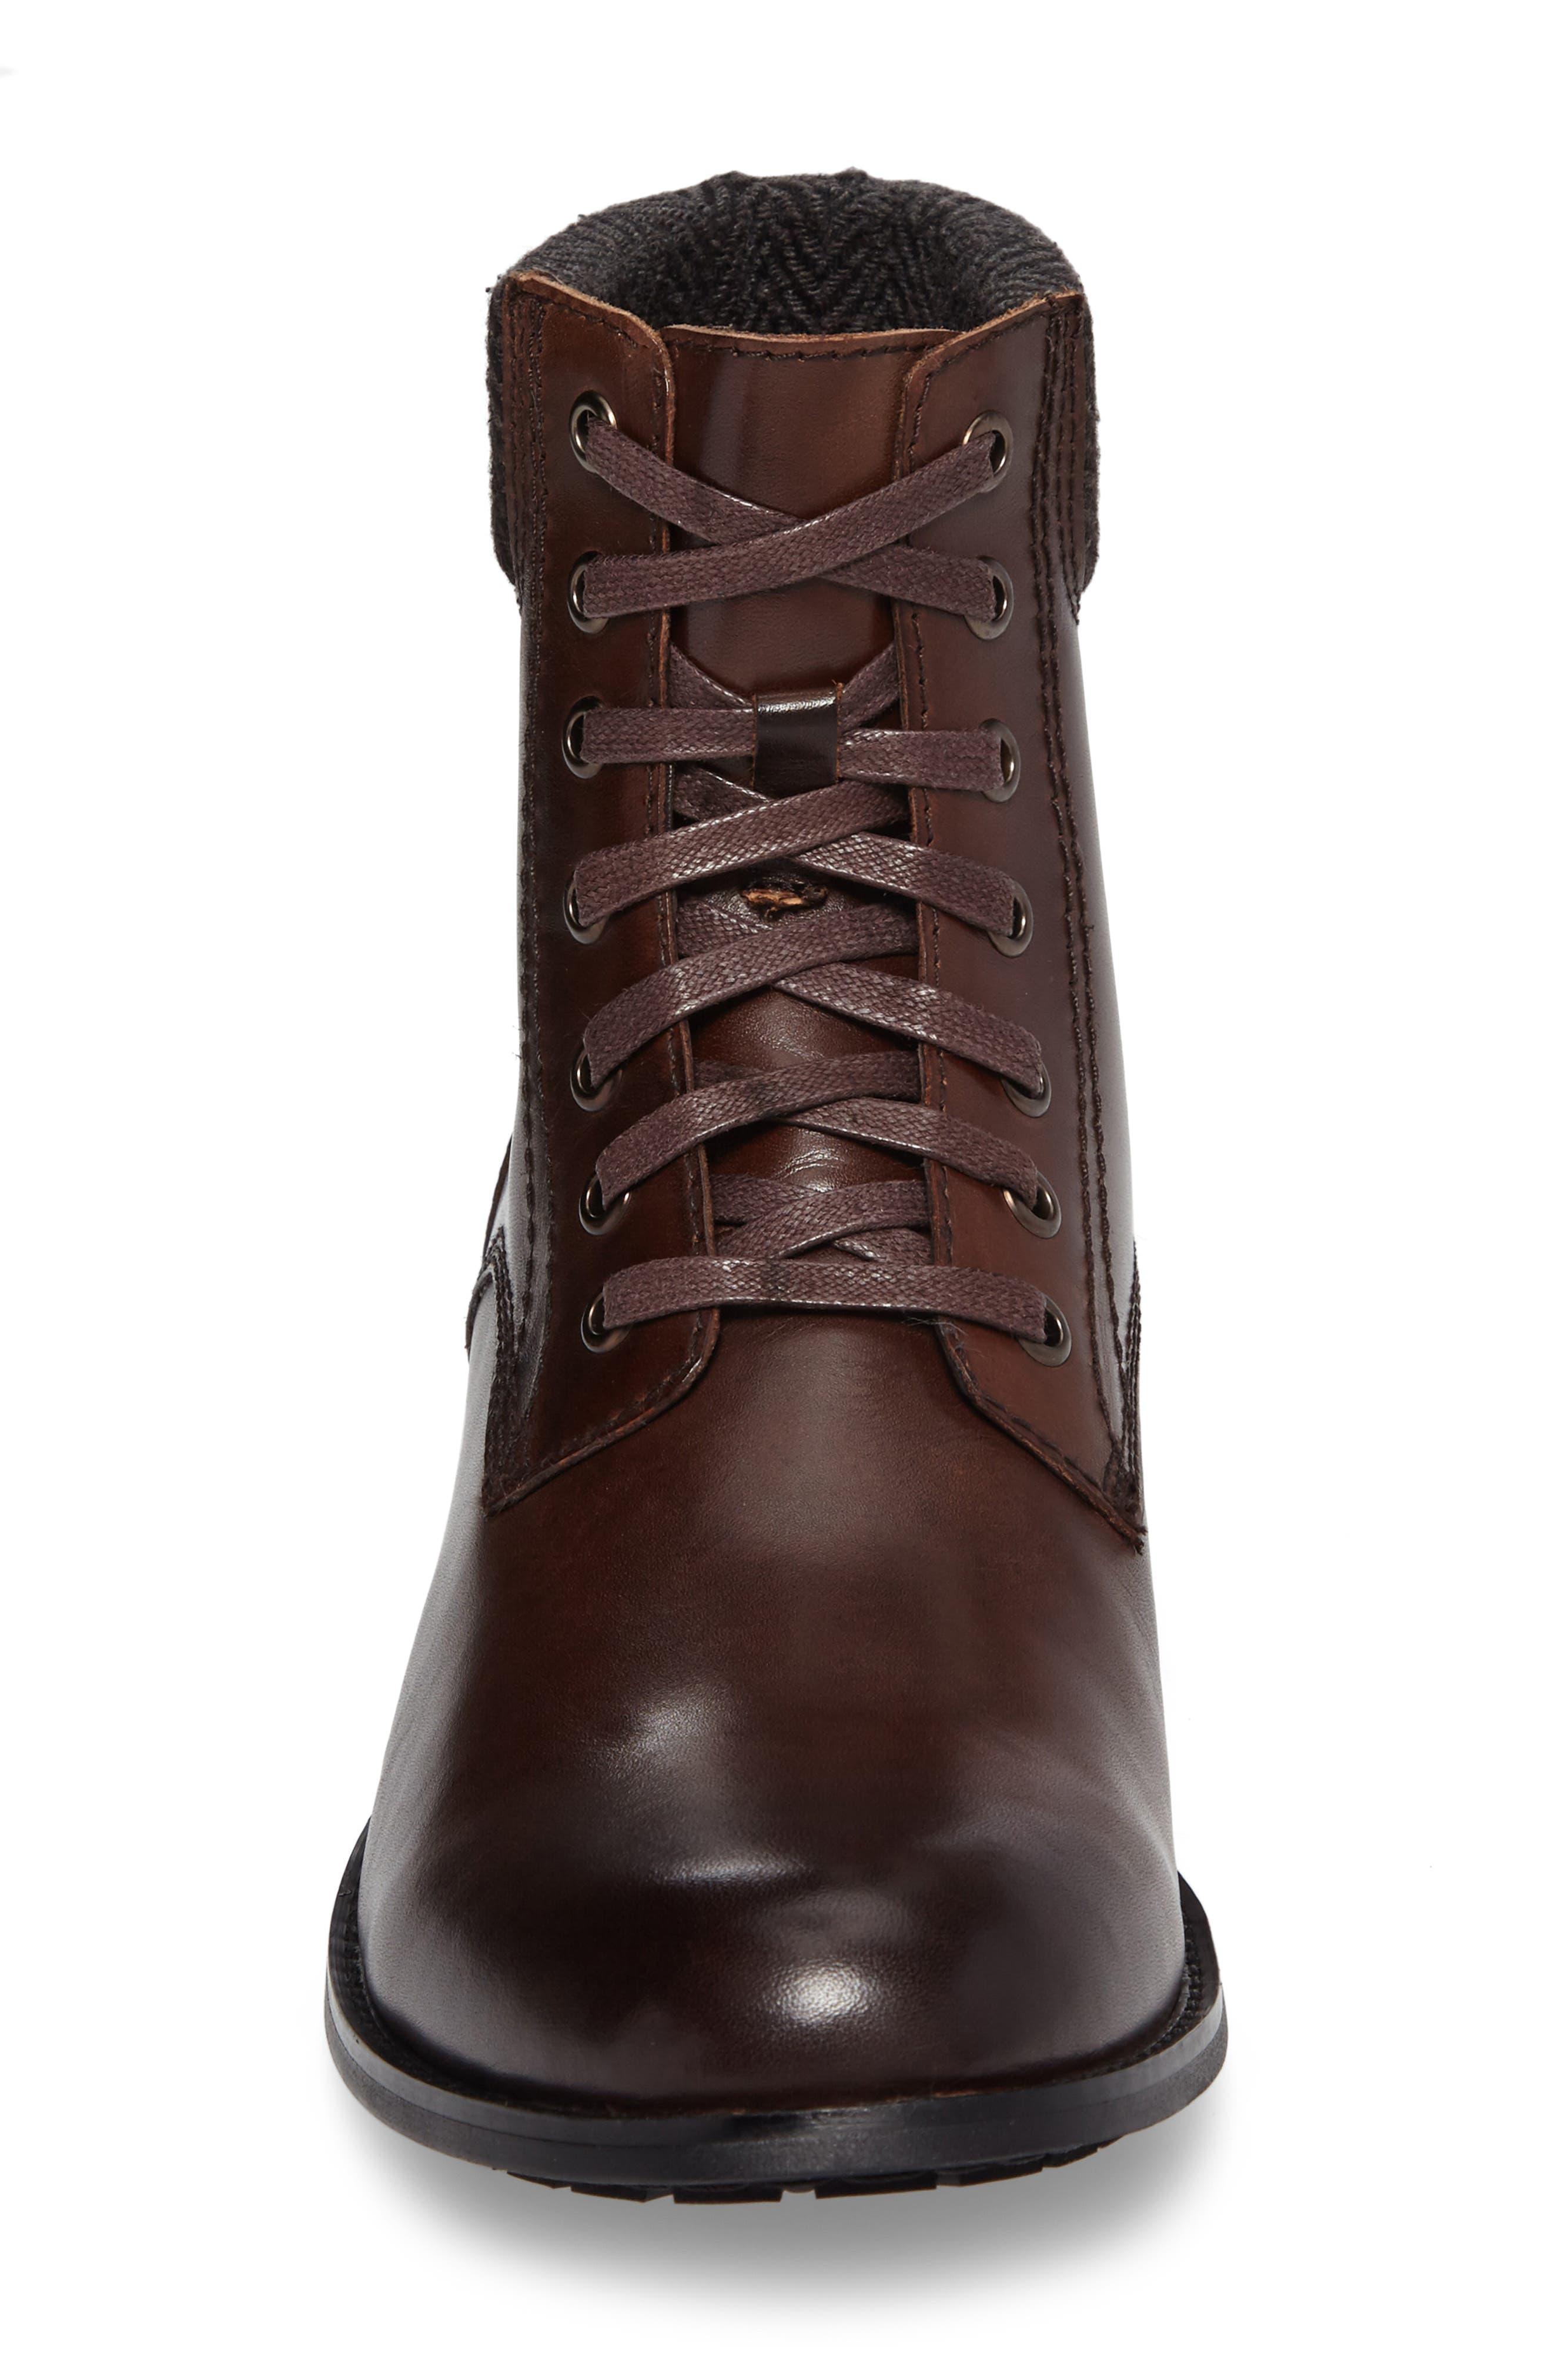 Saar Plain Toe Boot,                             Alternate thumbnail 4, color,                             Brown Leather